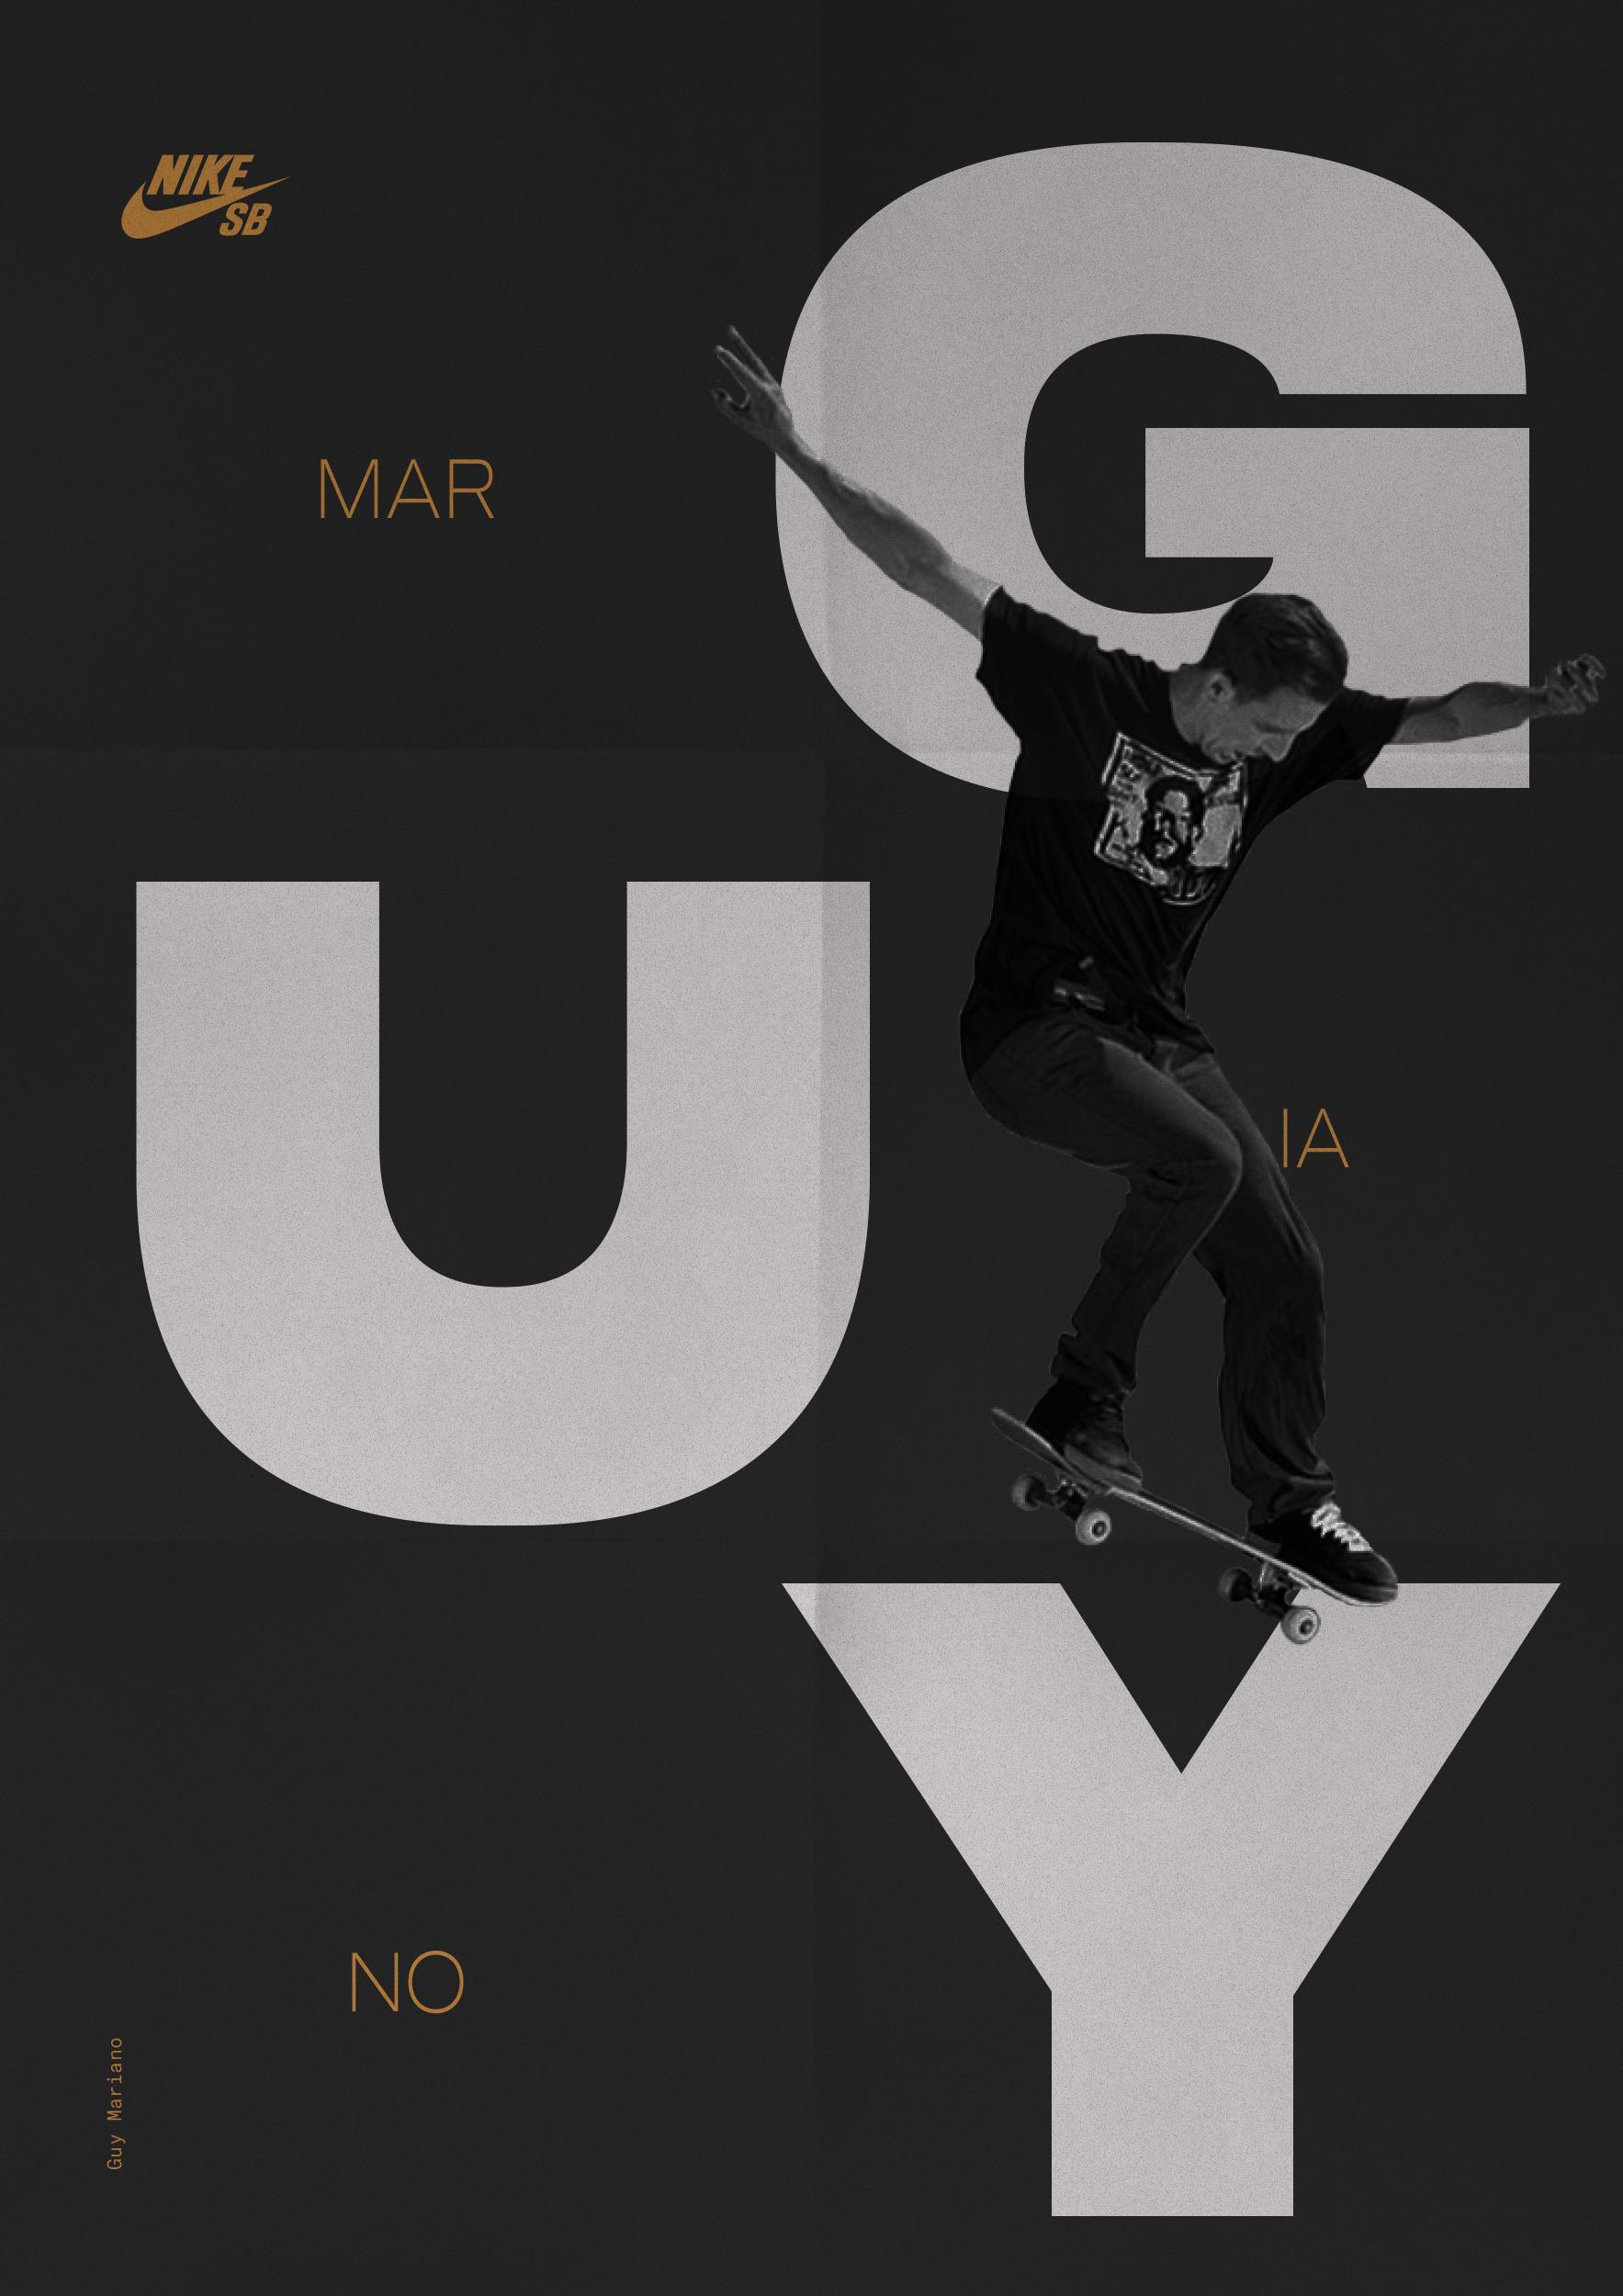 Guy Mariano. Nike SB - luiscoderque | ello